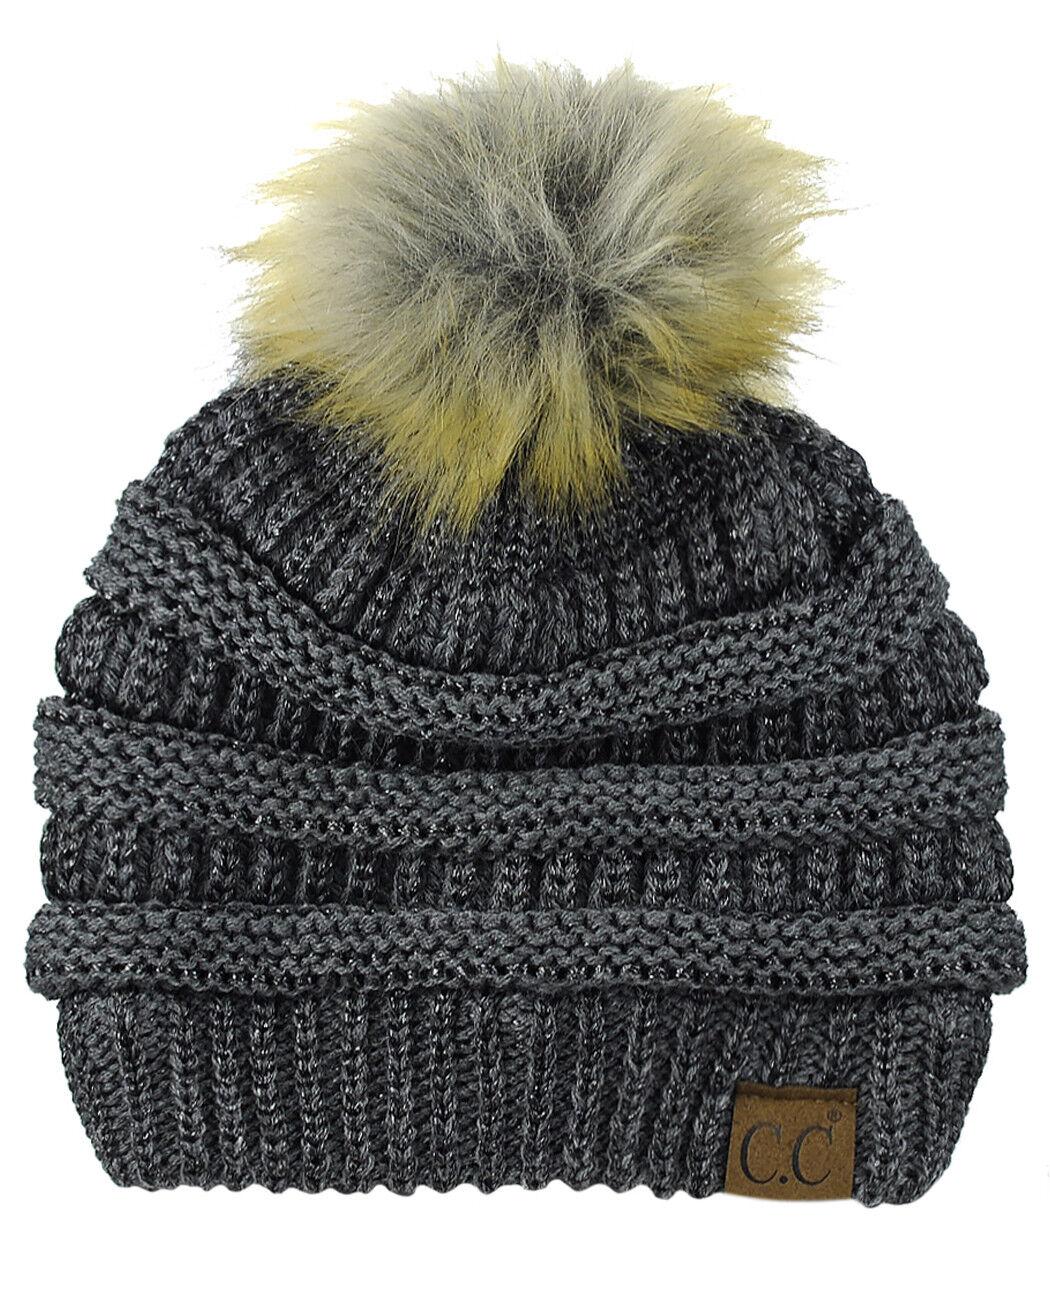 Neu    cc Brand Exklusiv Softstretch Zopfmuster Kunstpelz Bommel cc Mütze | Online Outlet Store  | Creative  | Mittel Preis  853994